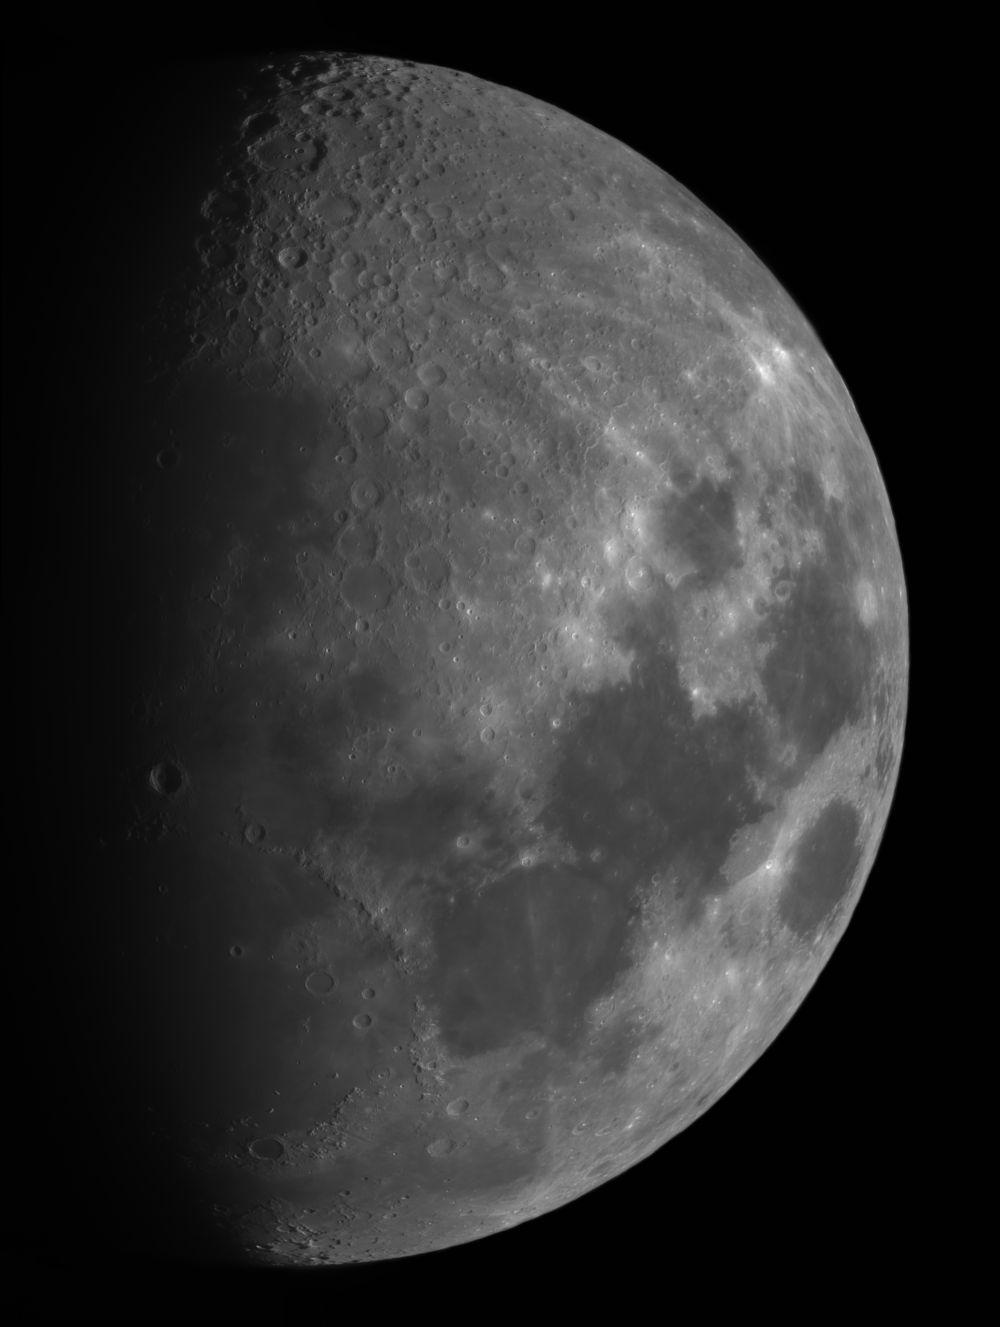 Луна. панорамка